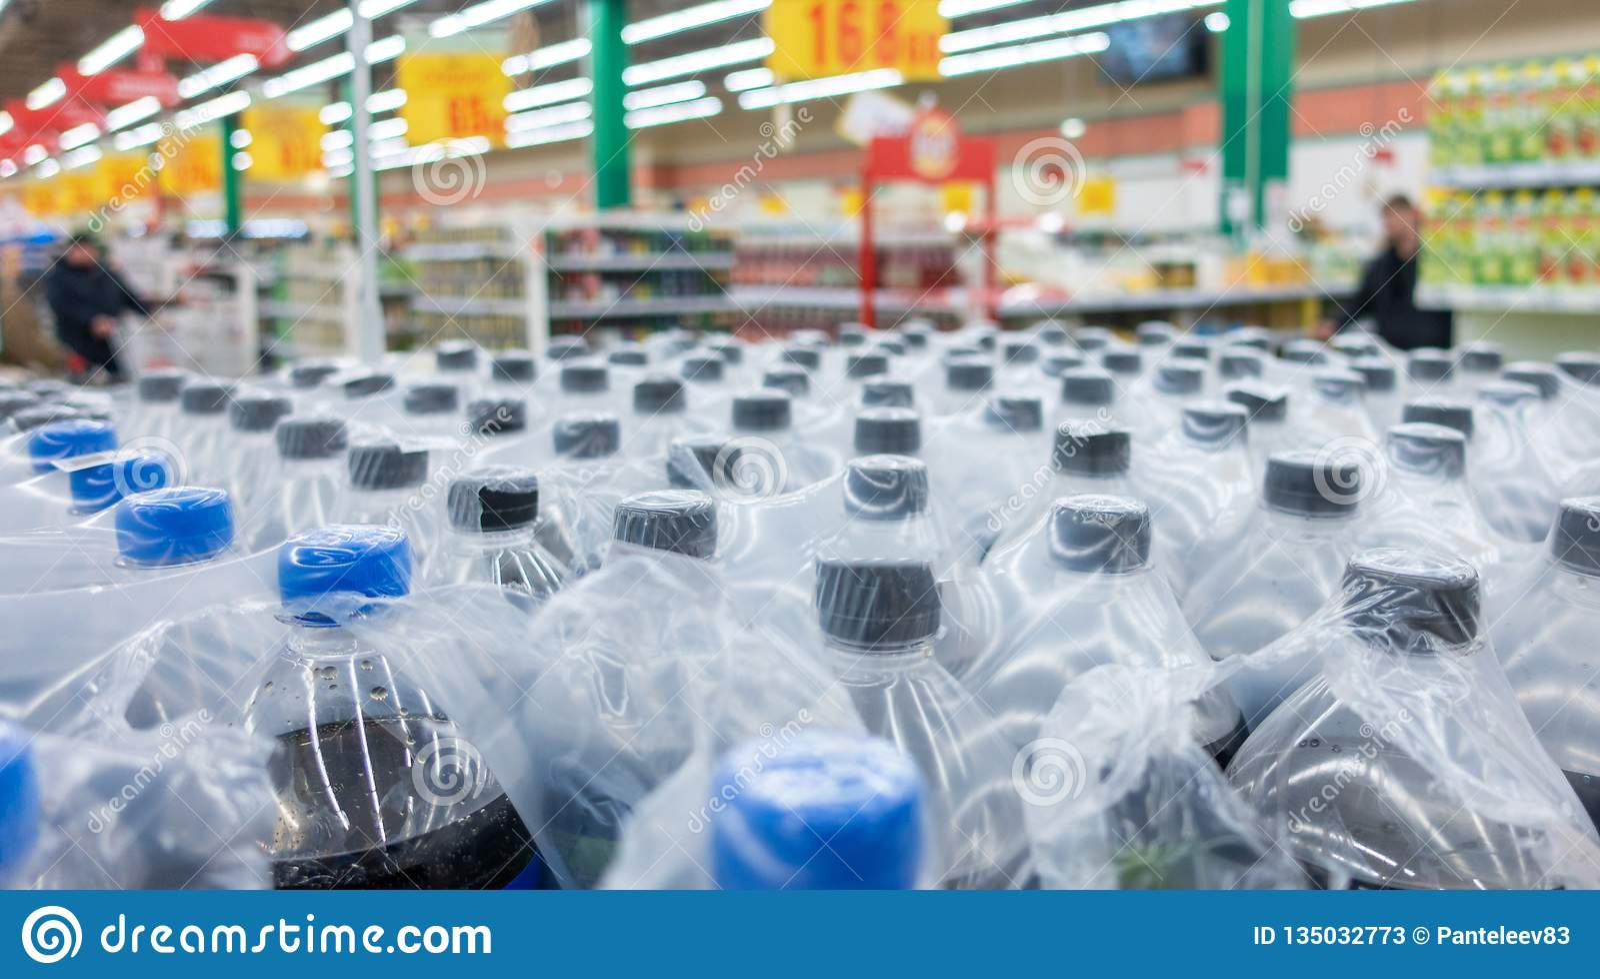 Plastic bottles in packs. Water bottles - plastic bottles factory warehouse store food background.